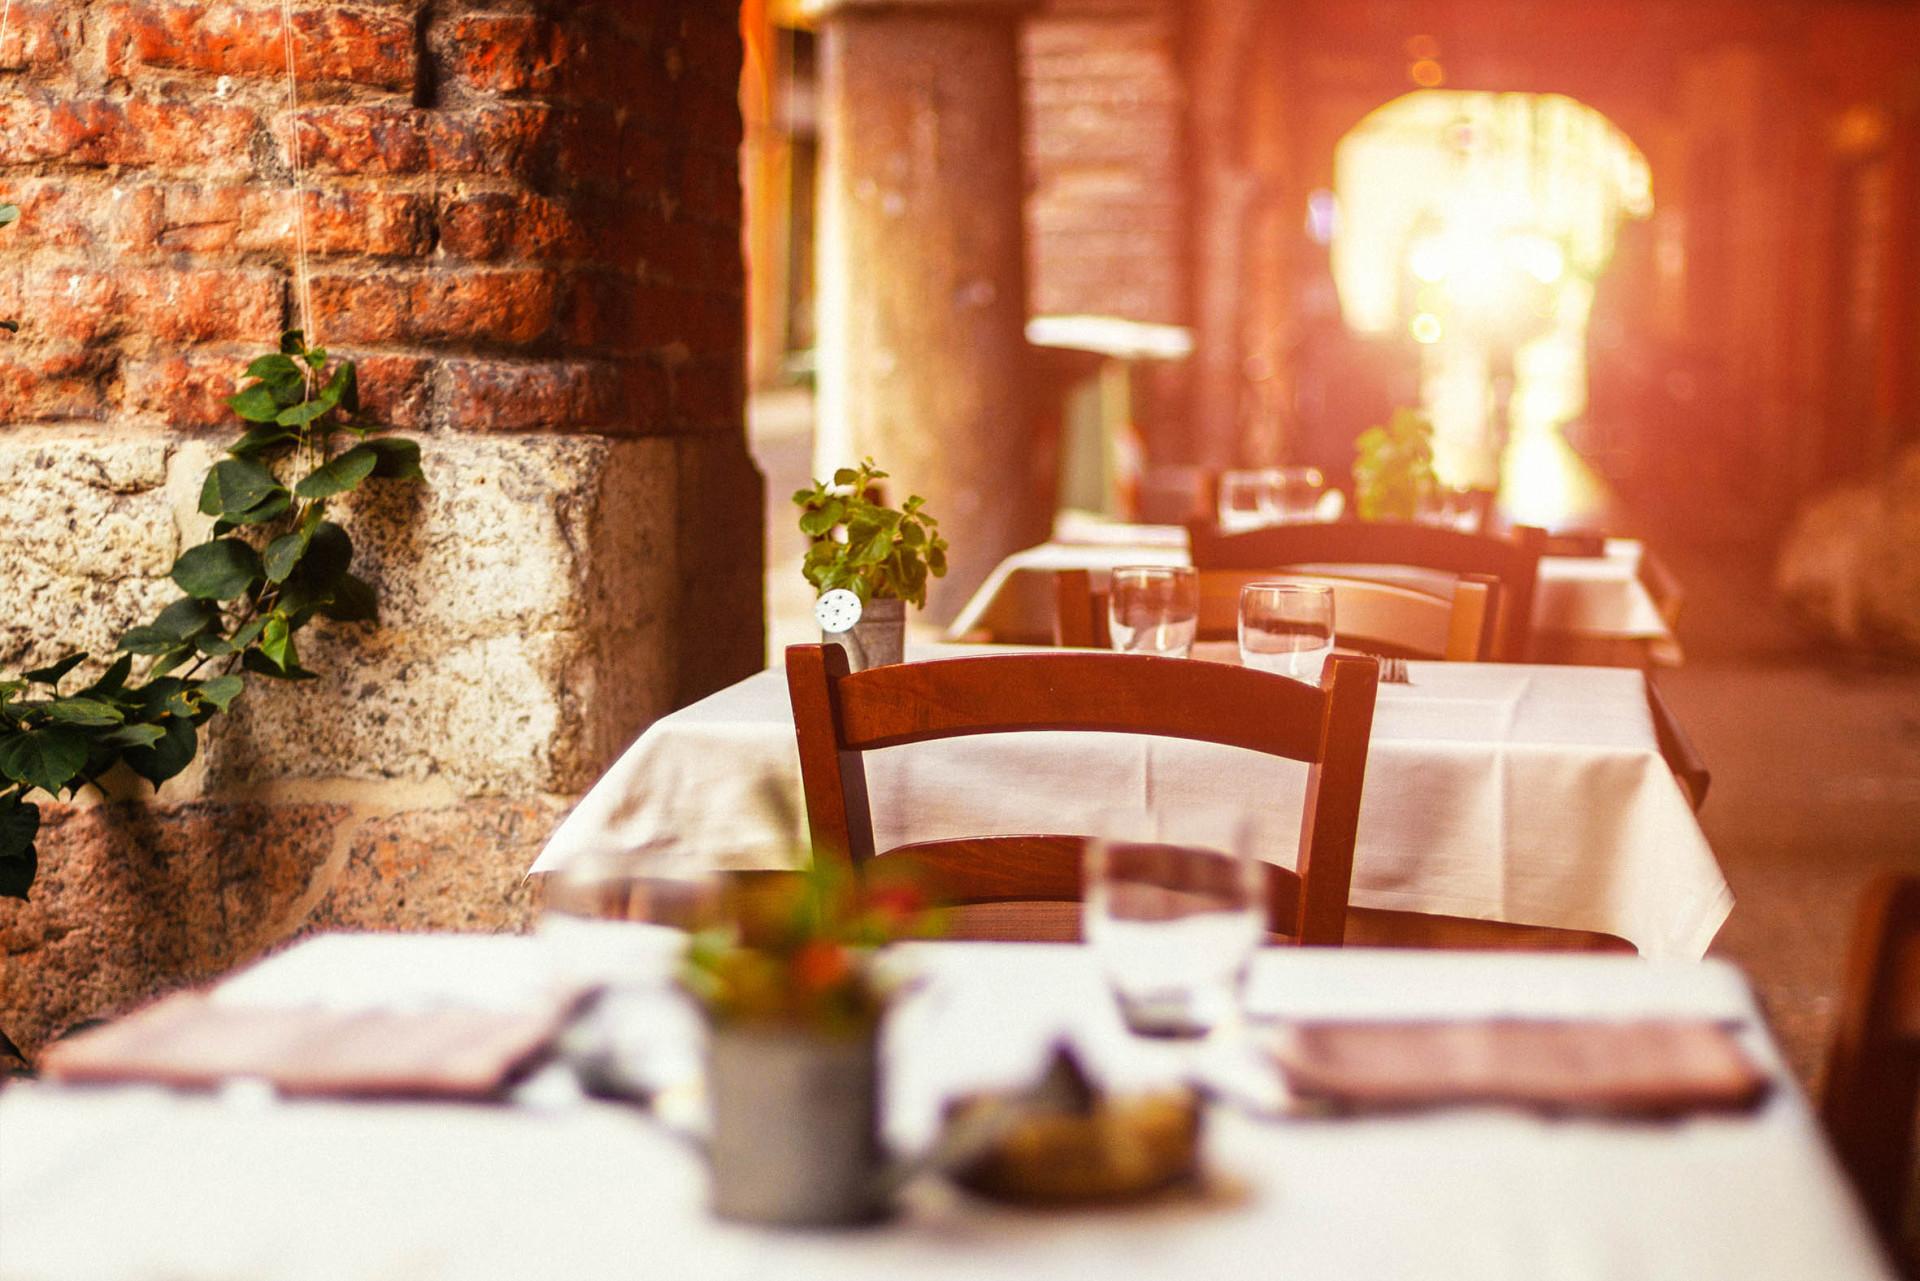 Italienisches Restaurant iStock_000022433098_Large-2